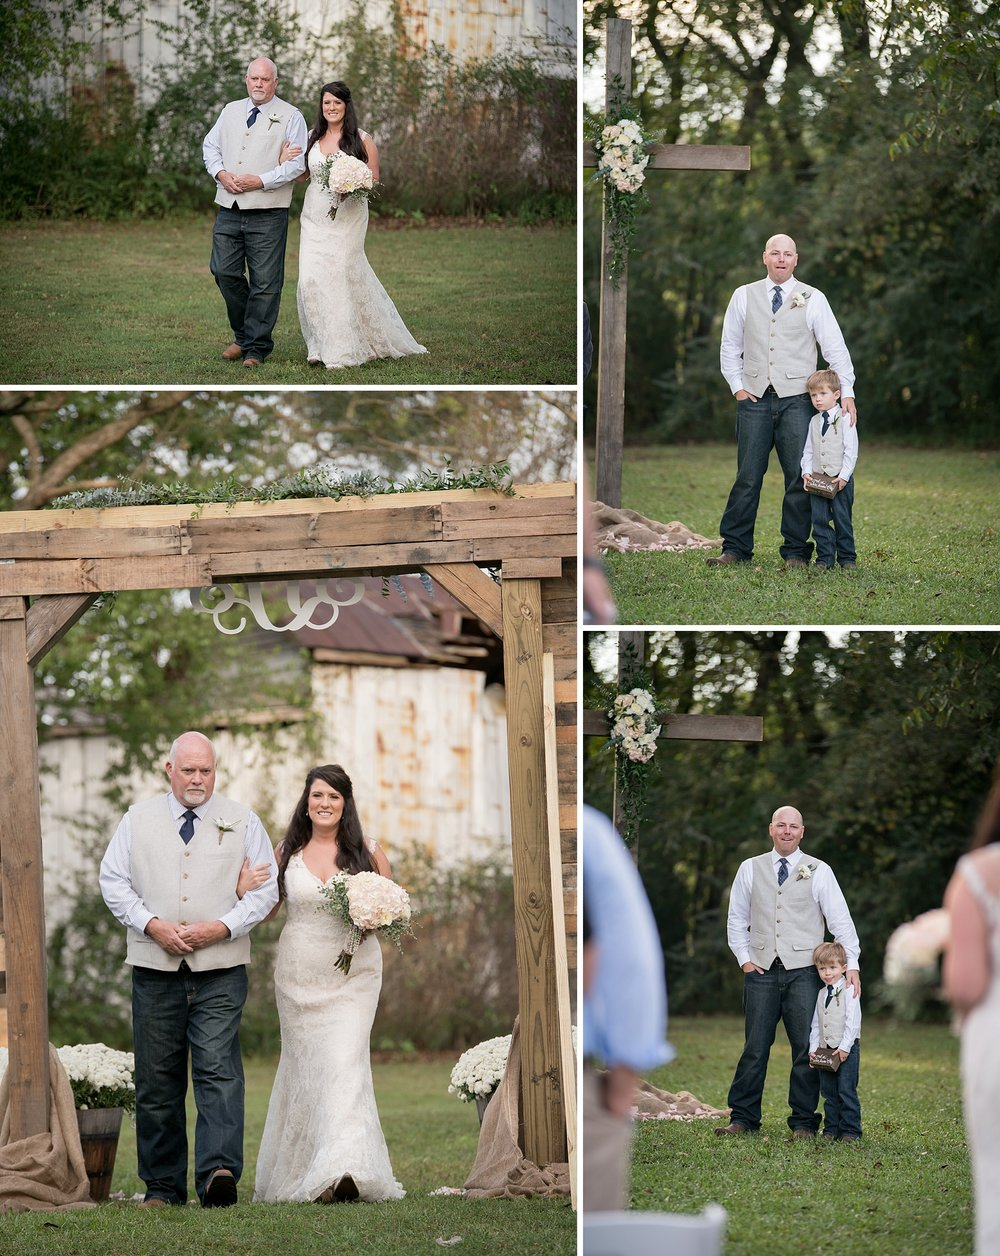 Tarboro-NC-Wedding-Photographer-049.jpg